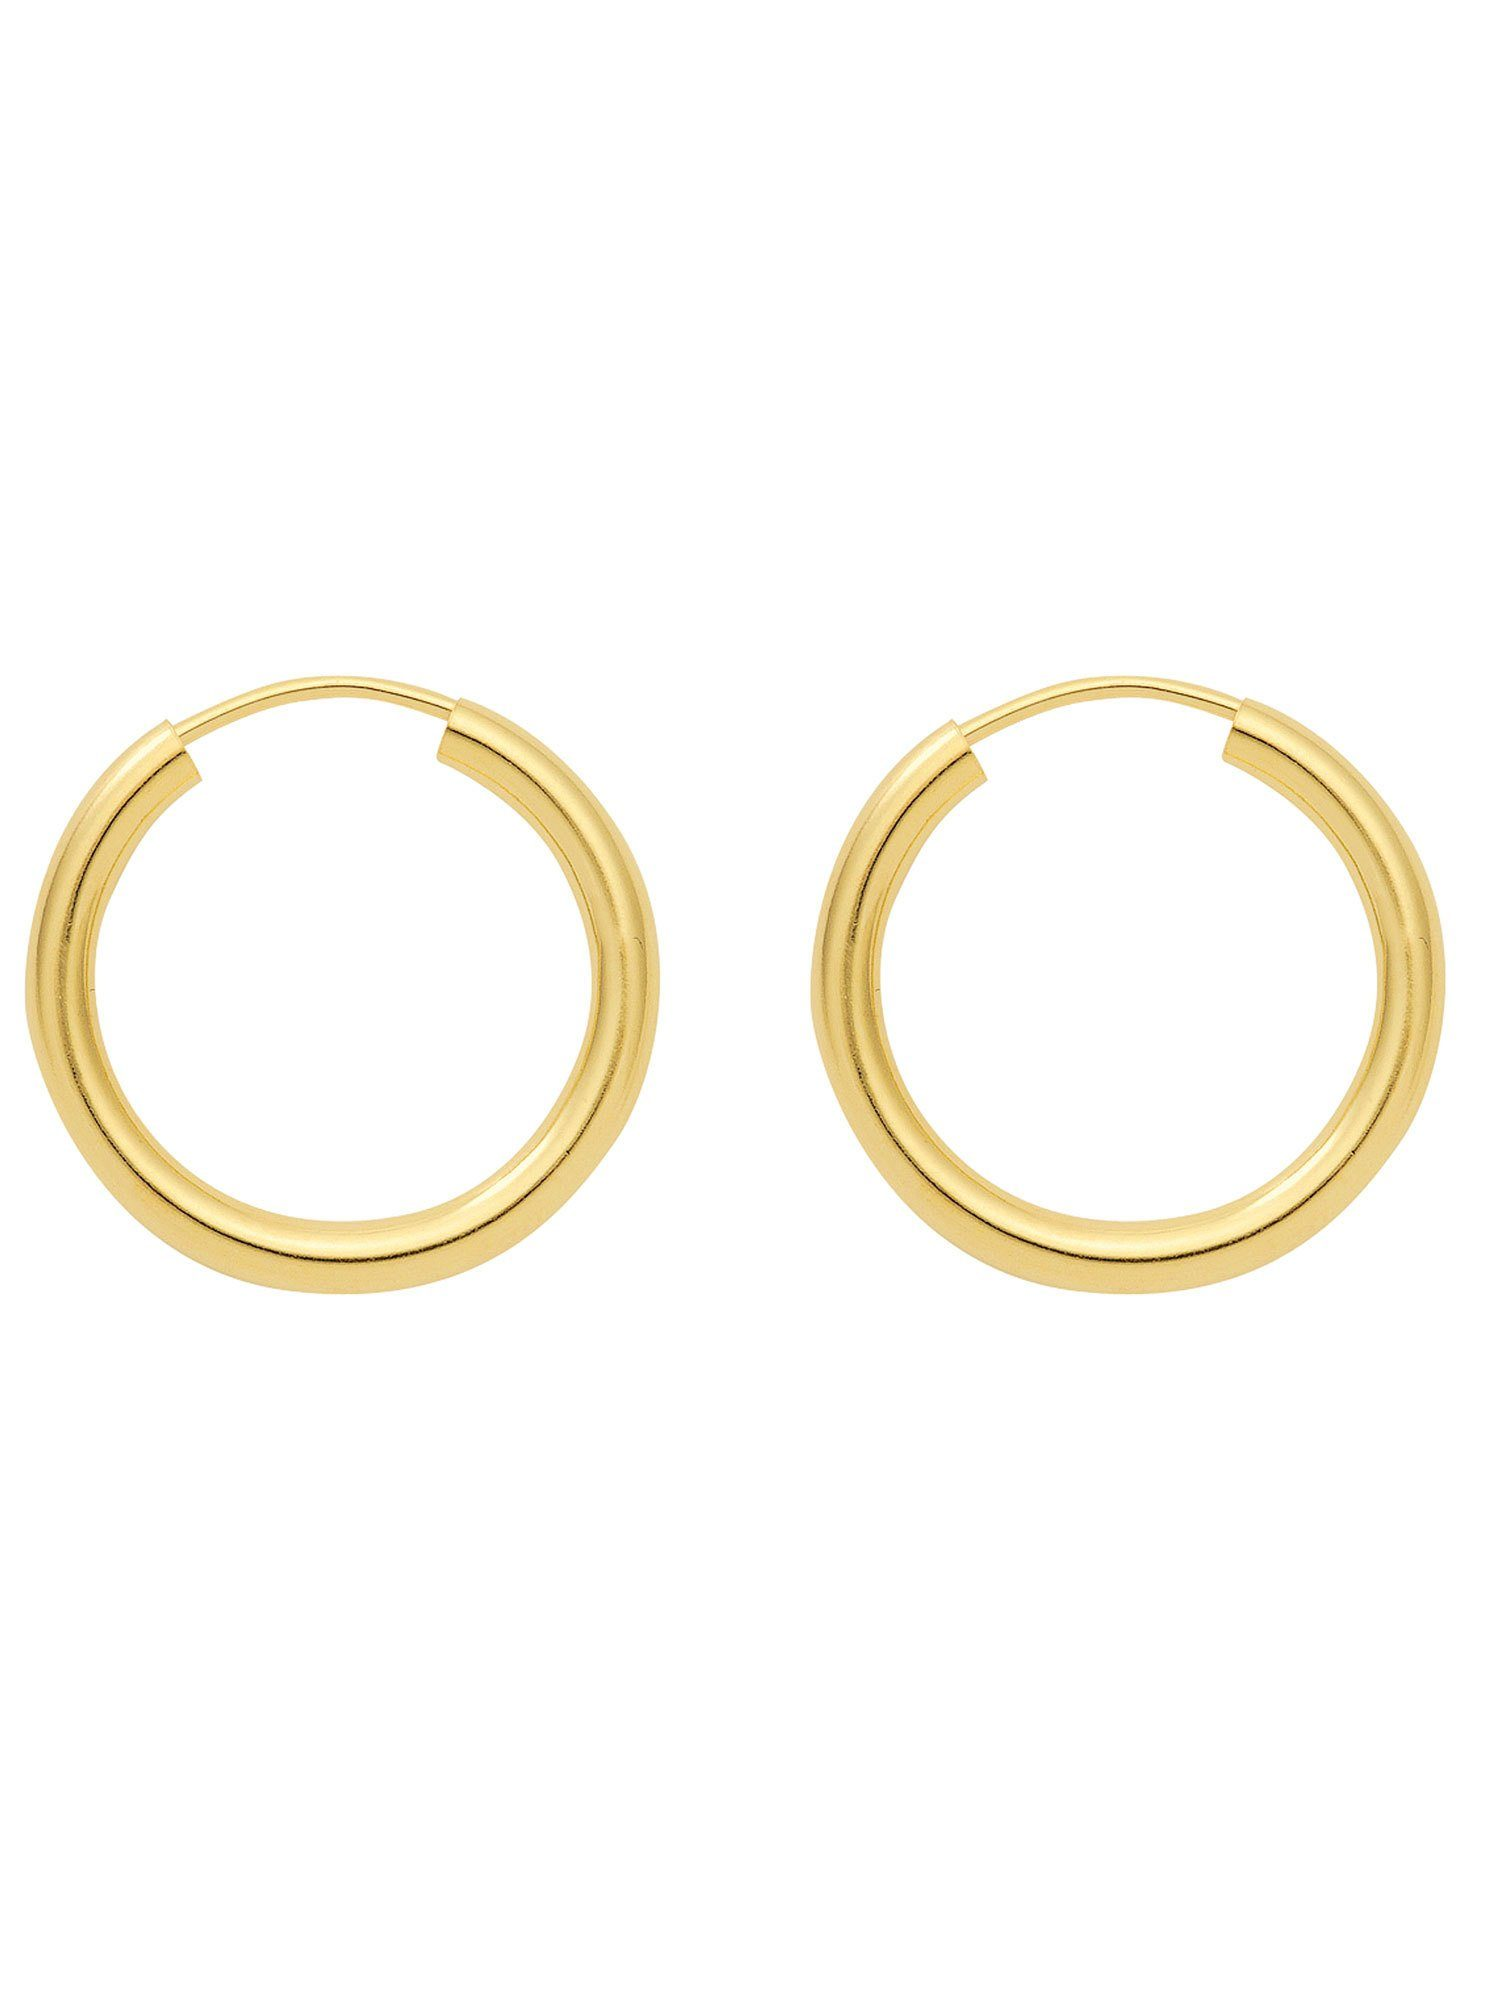 Adelia´s Paar Creolen »Silber Ohrringe« 925 Sterling Silber vergoldet Ø 3 cm